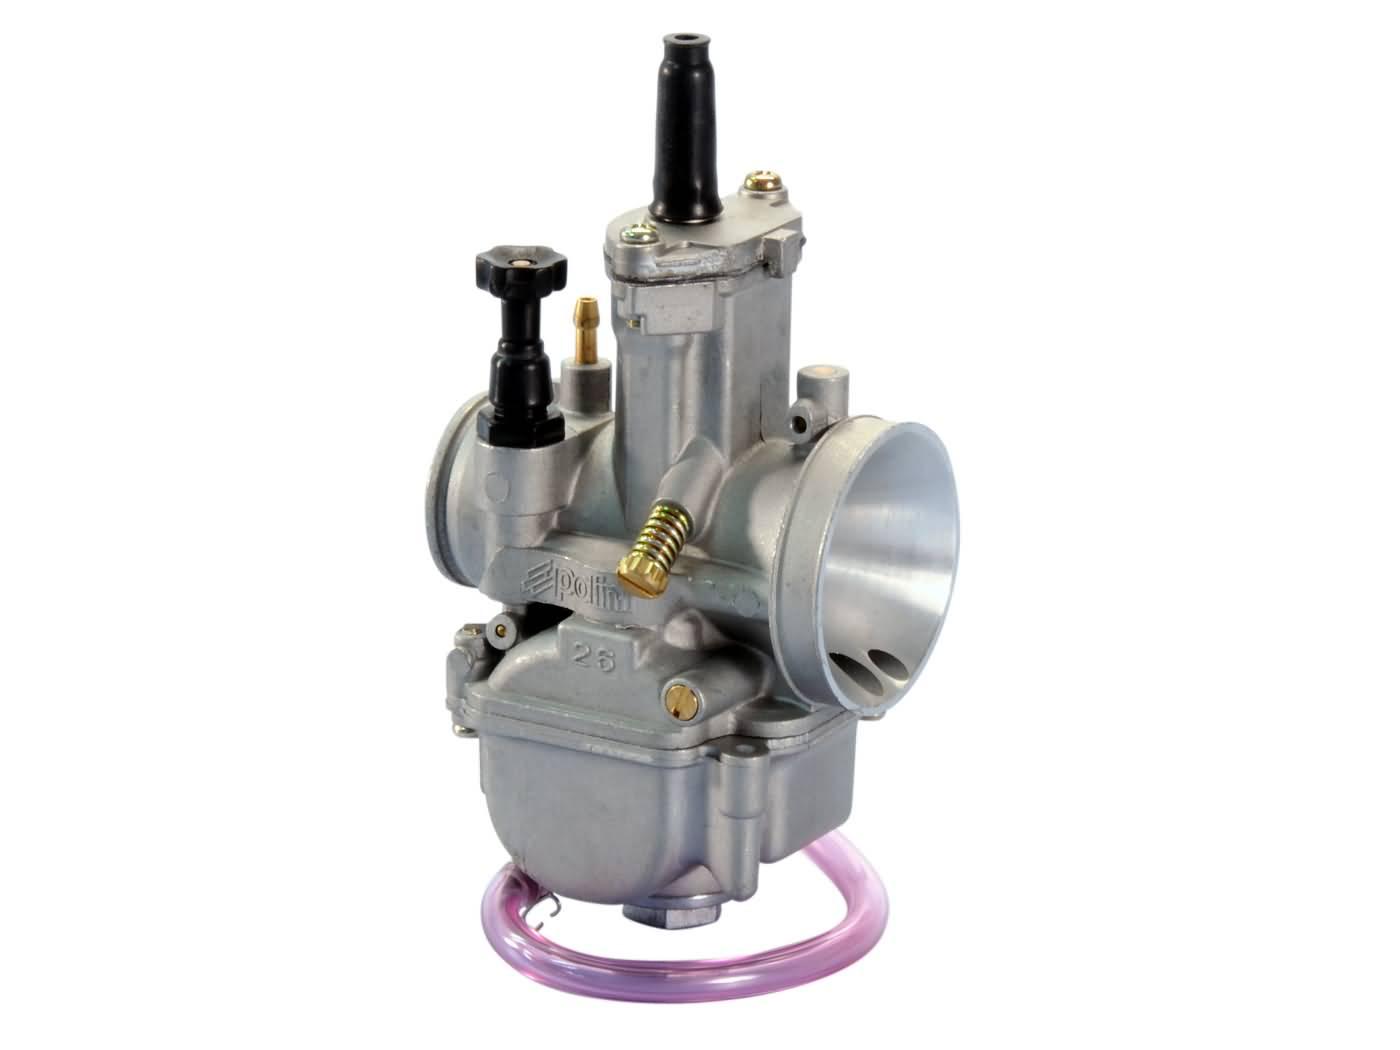 Dichtungssatz Dichtsatz Zylinder 50ccm Honda Lead SH Scoopy Vision Italjet Adly